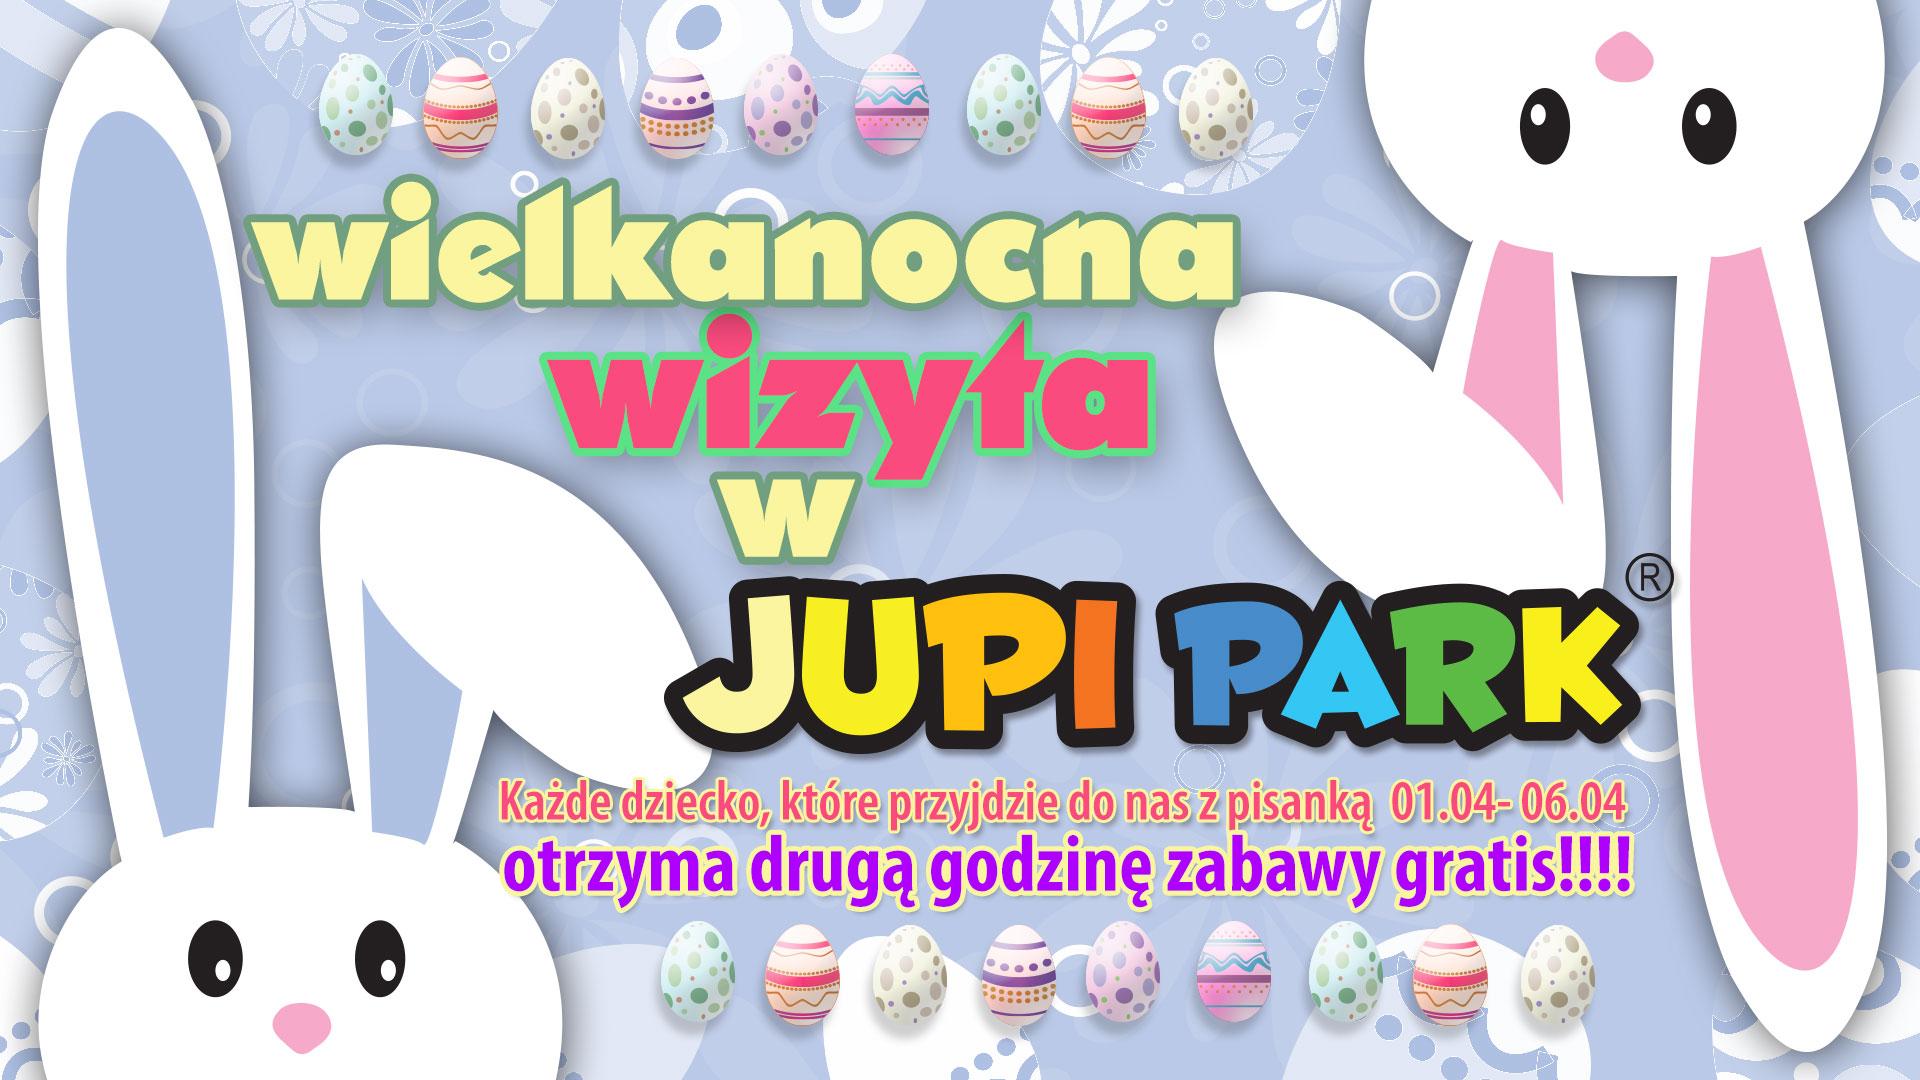 Druga godzina zabawy gratis @ Jupi Park